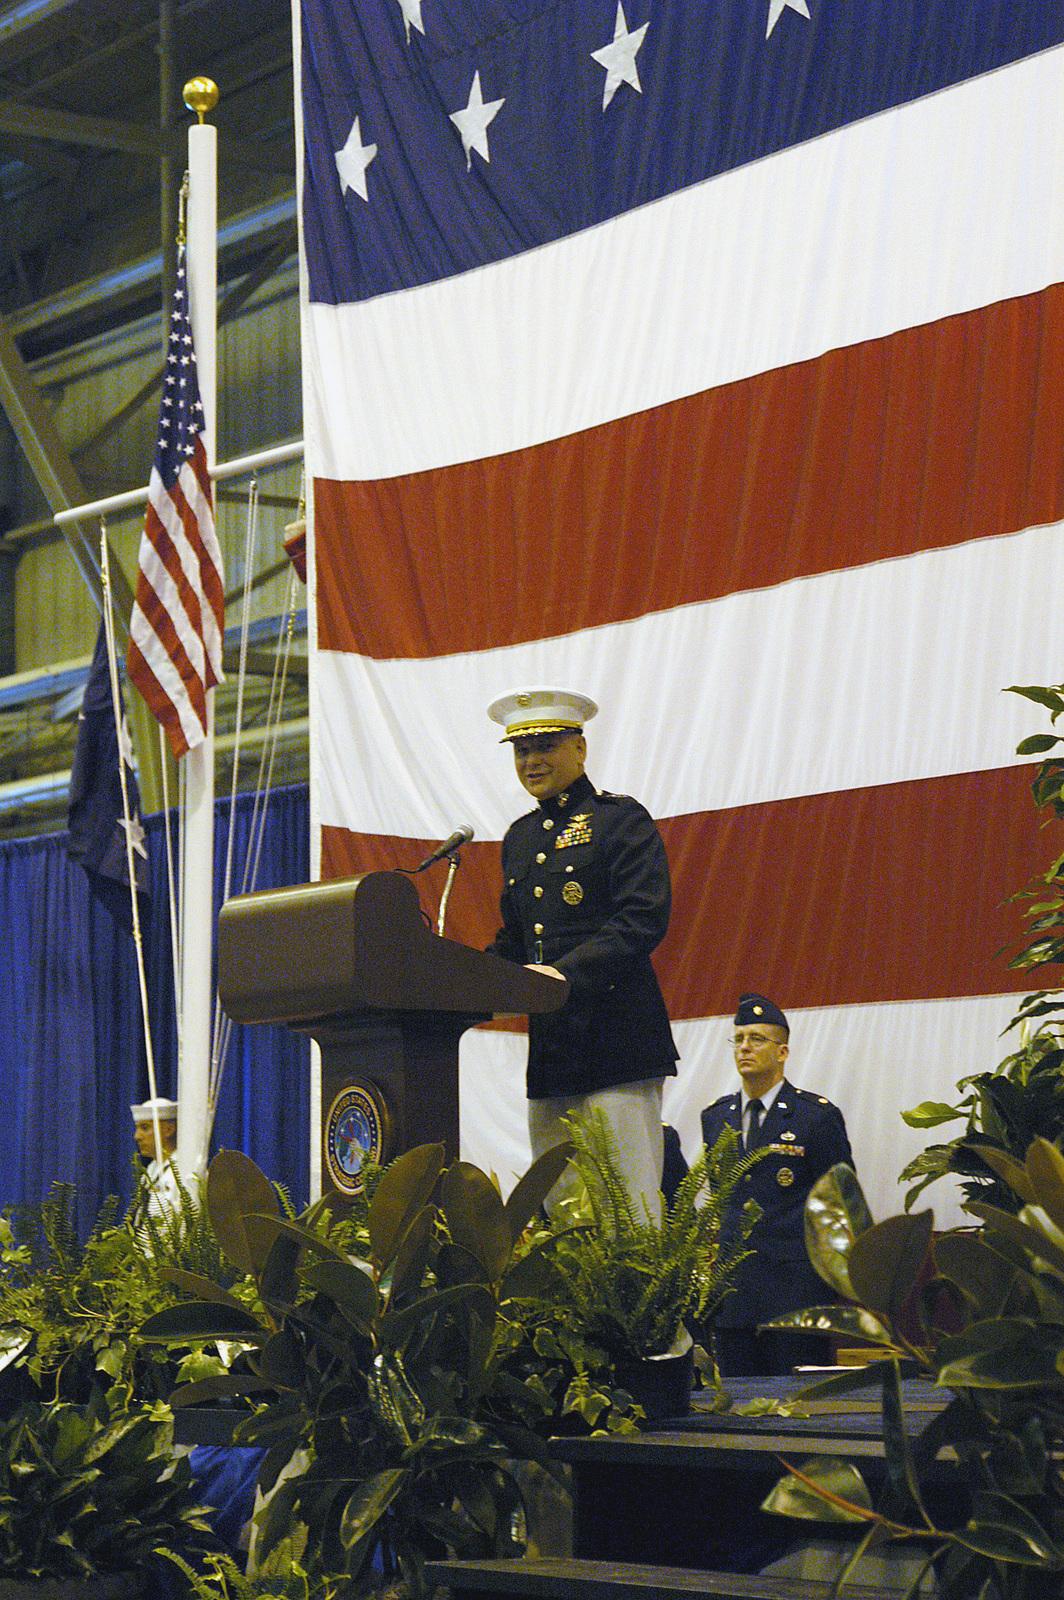 US Marine Corps (USMC) Lieutenant General (LGEN) James E